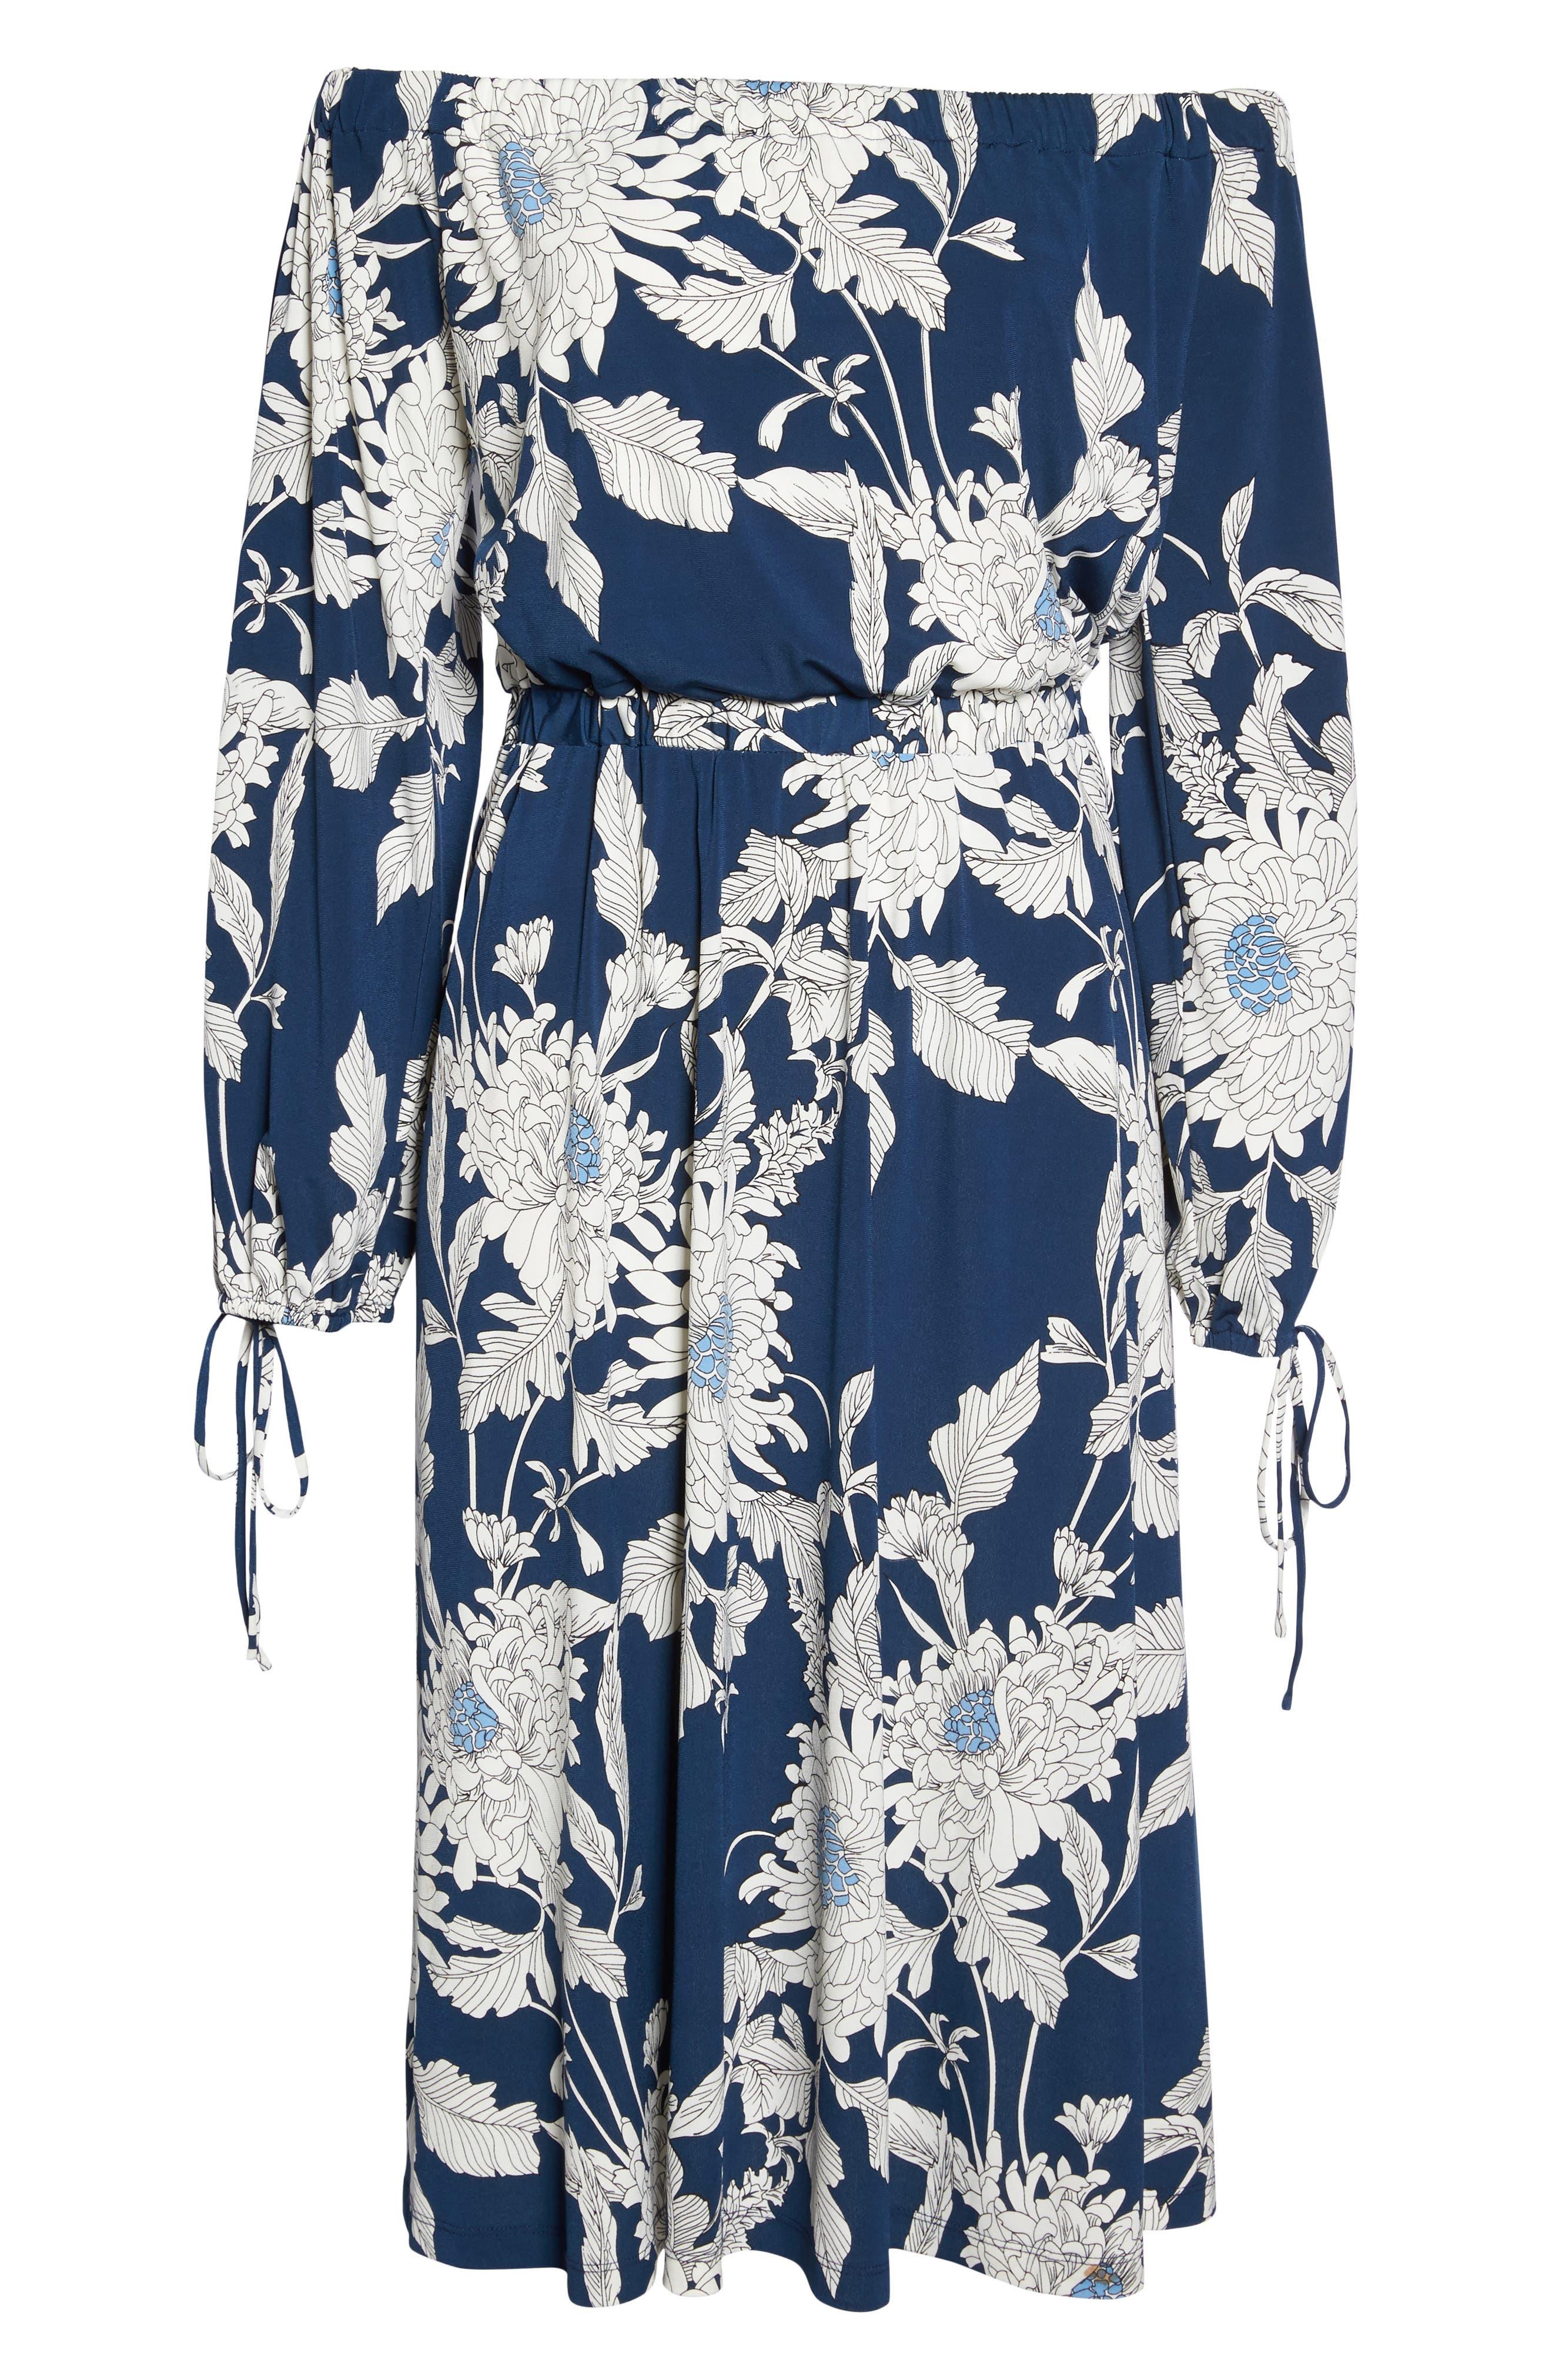 Print Jersey Off the Shoulder Blouson Dress,                             Alternate thumbnail 6, color,                             402